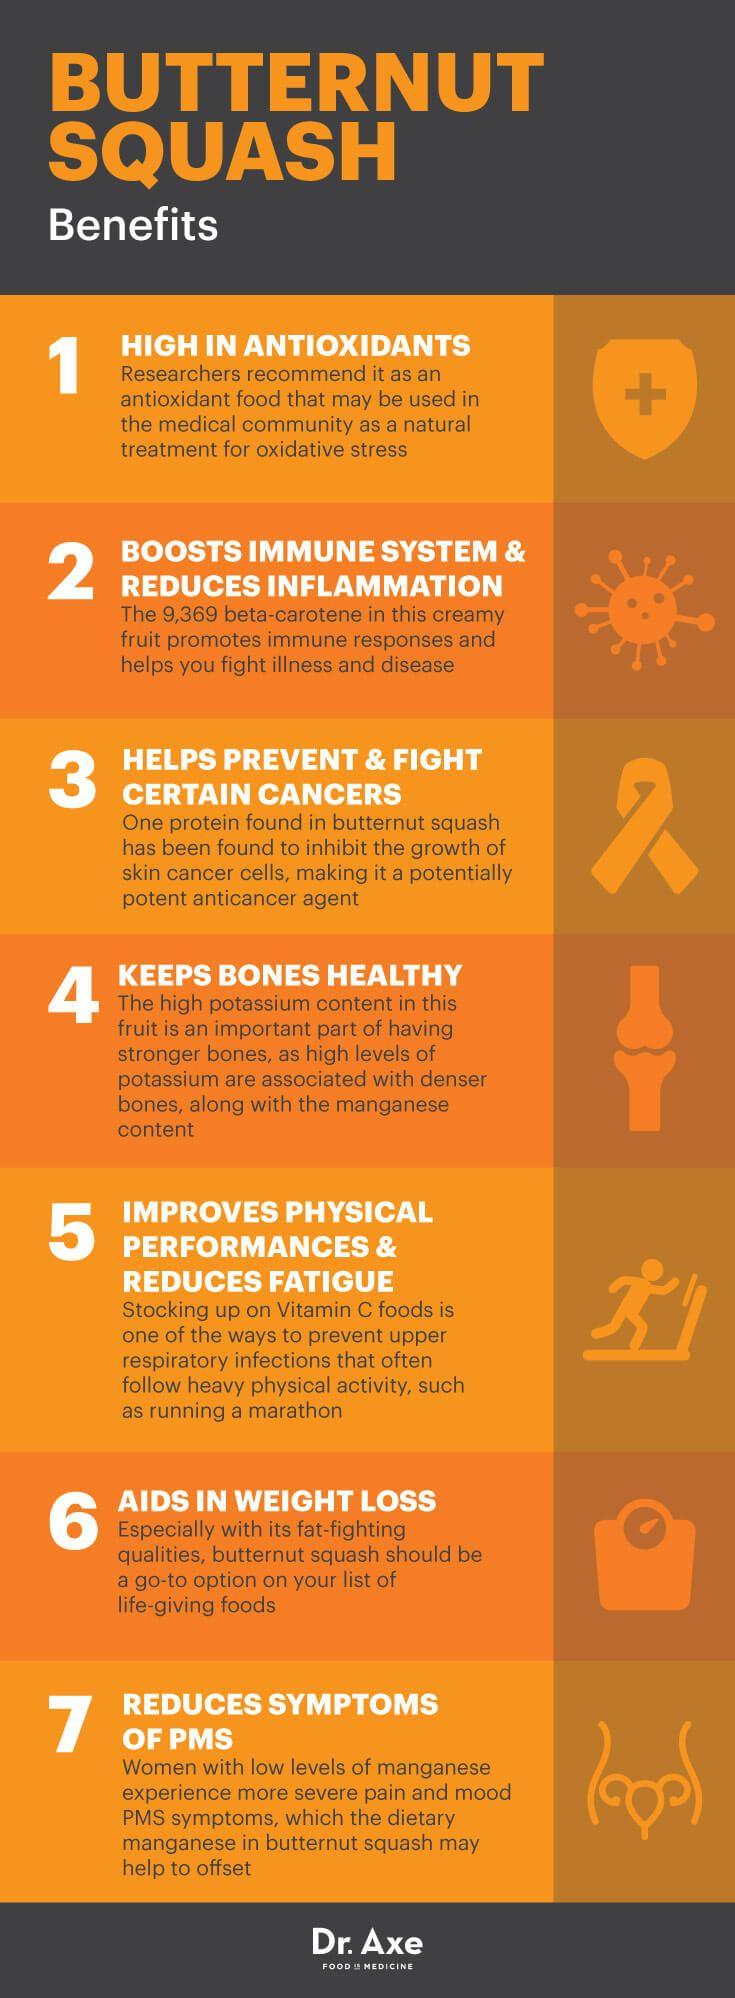 Butternut squash benefits - Dr. Axe  http://www.draxe.com #health #holistic #natural